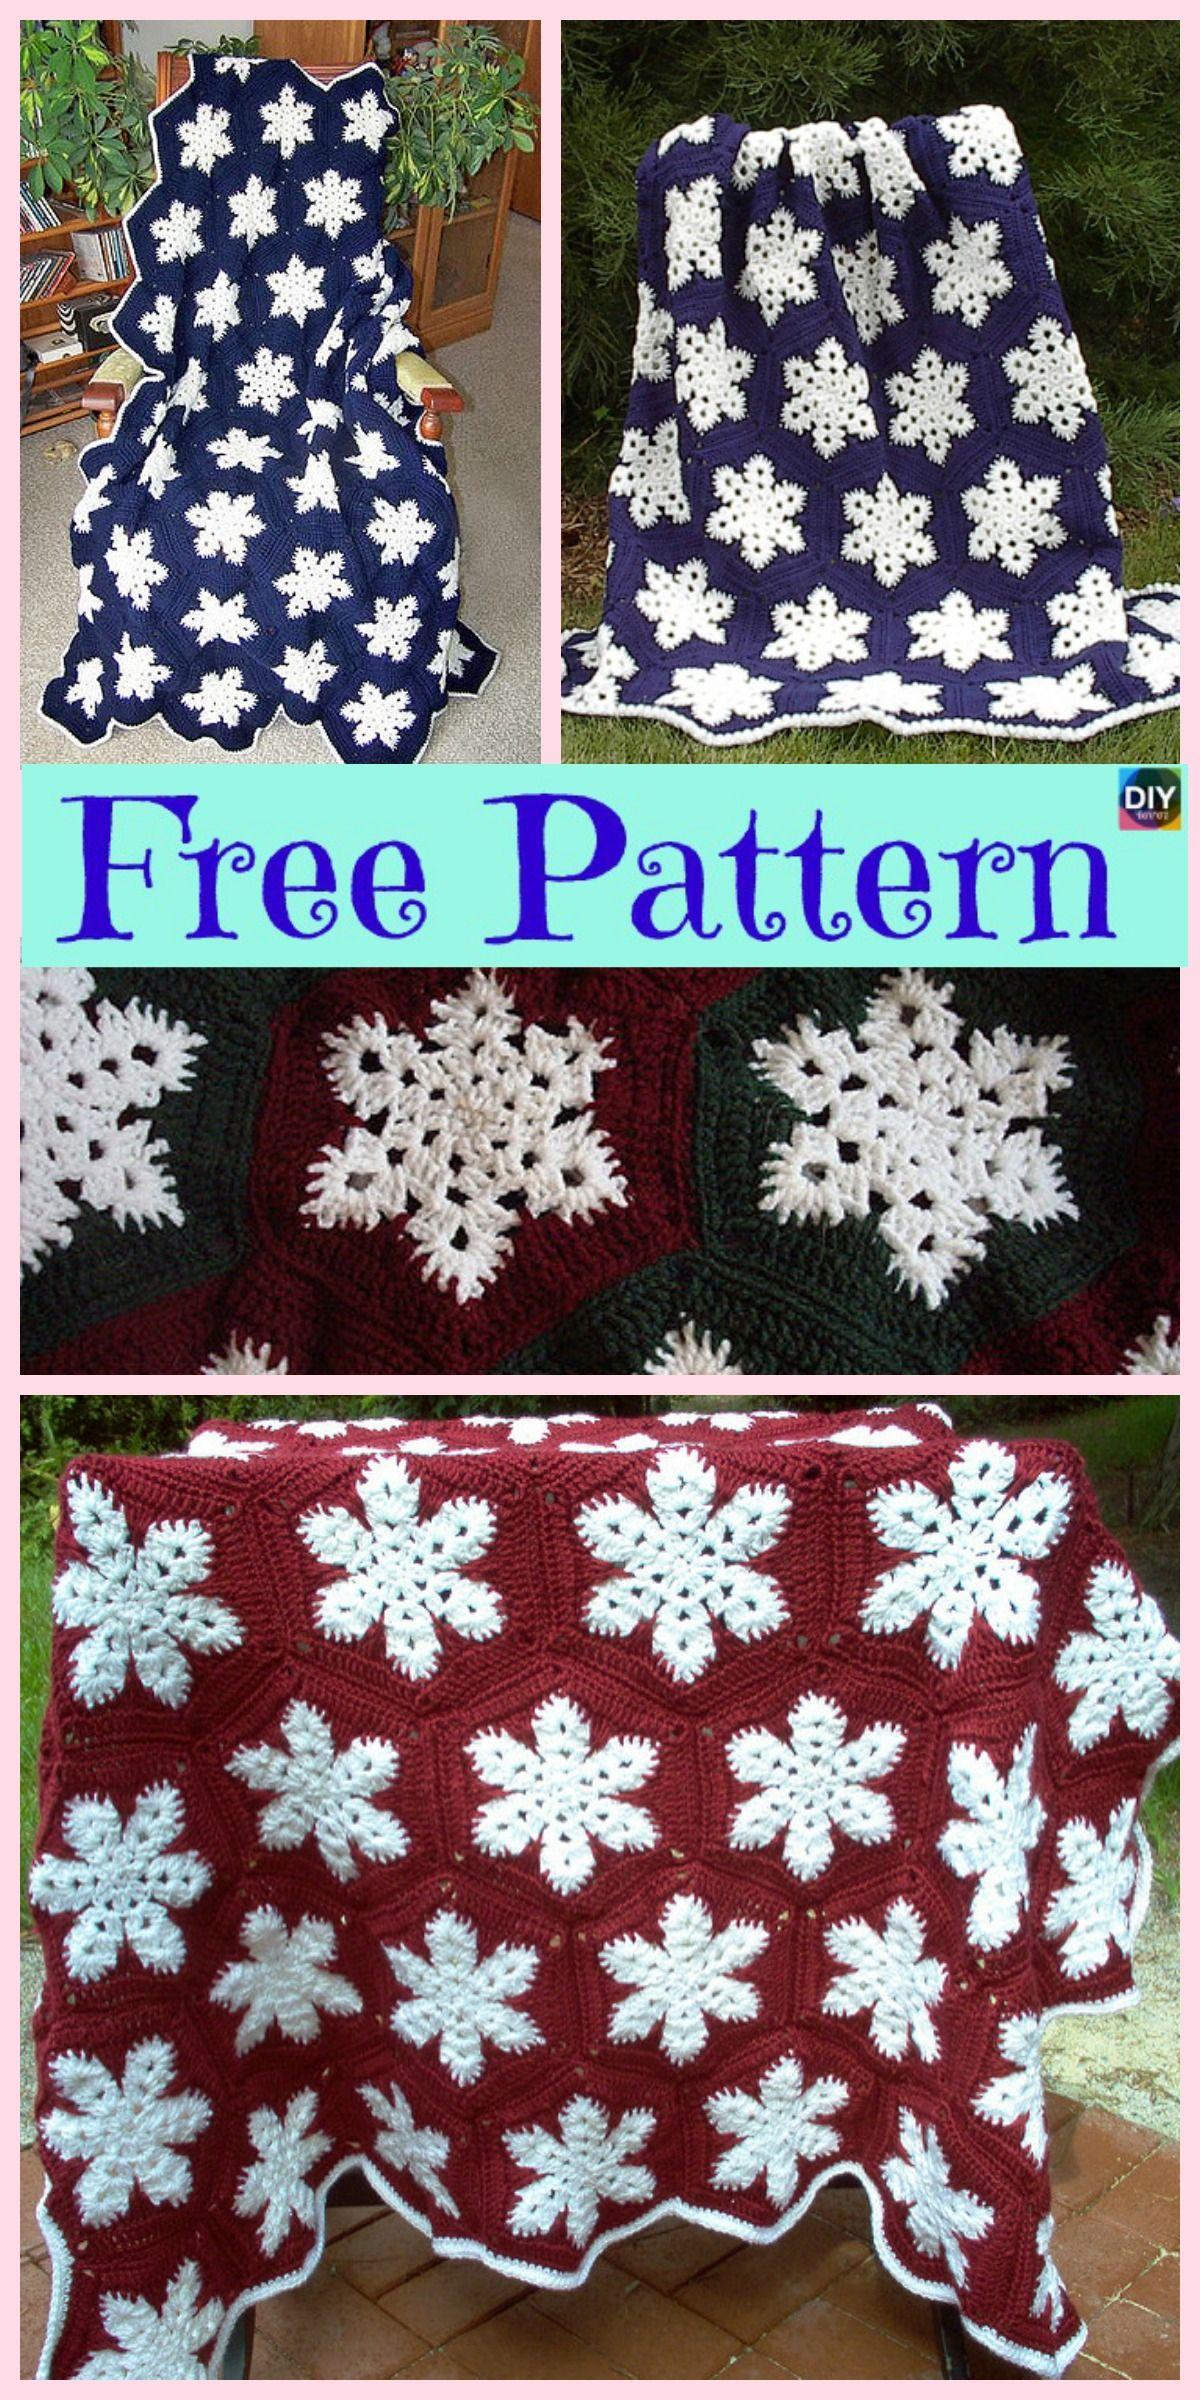 Beautiful Crochet Snowflake Afghan Free Pattern Hklet Tppe